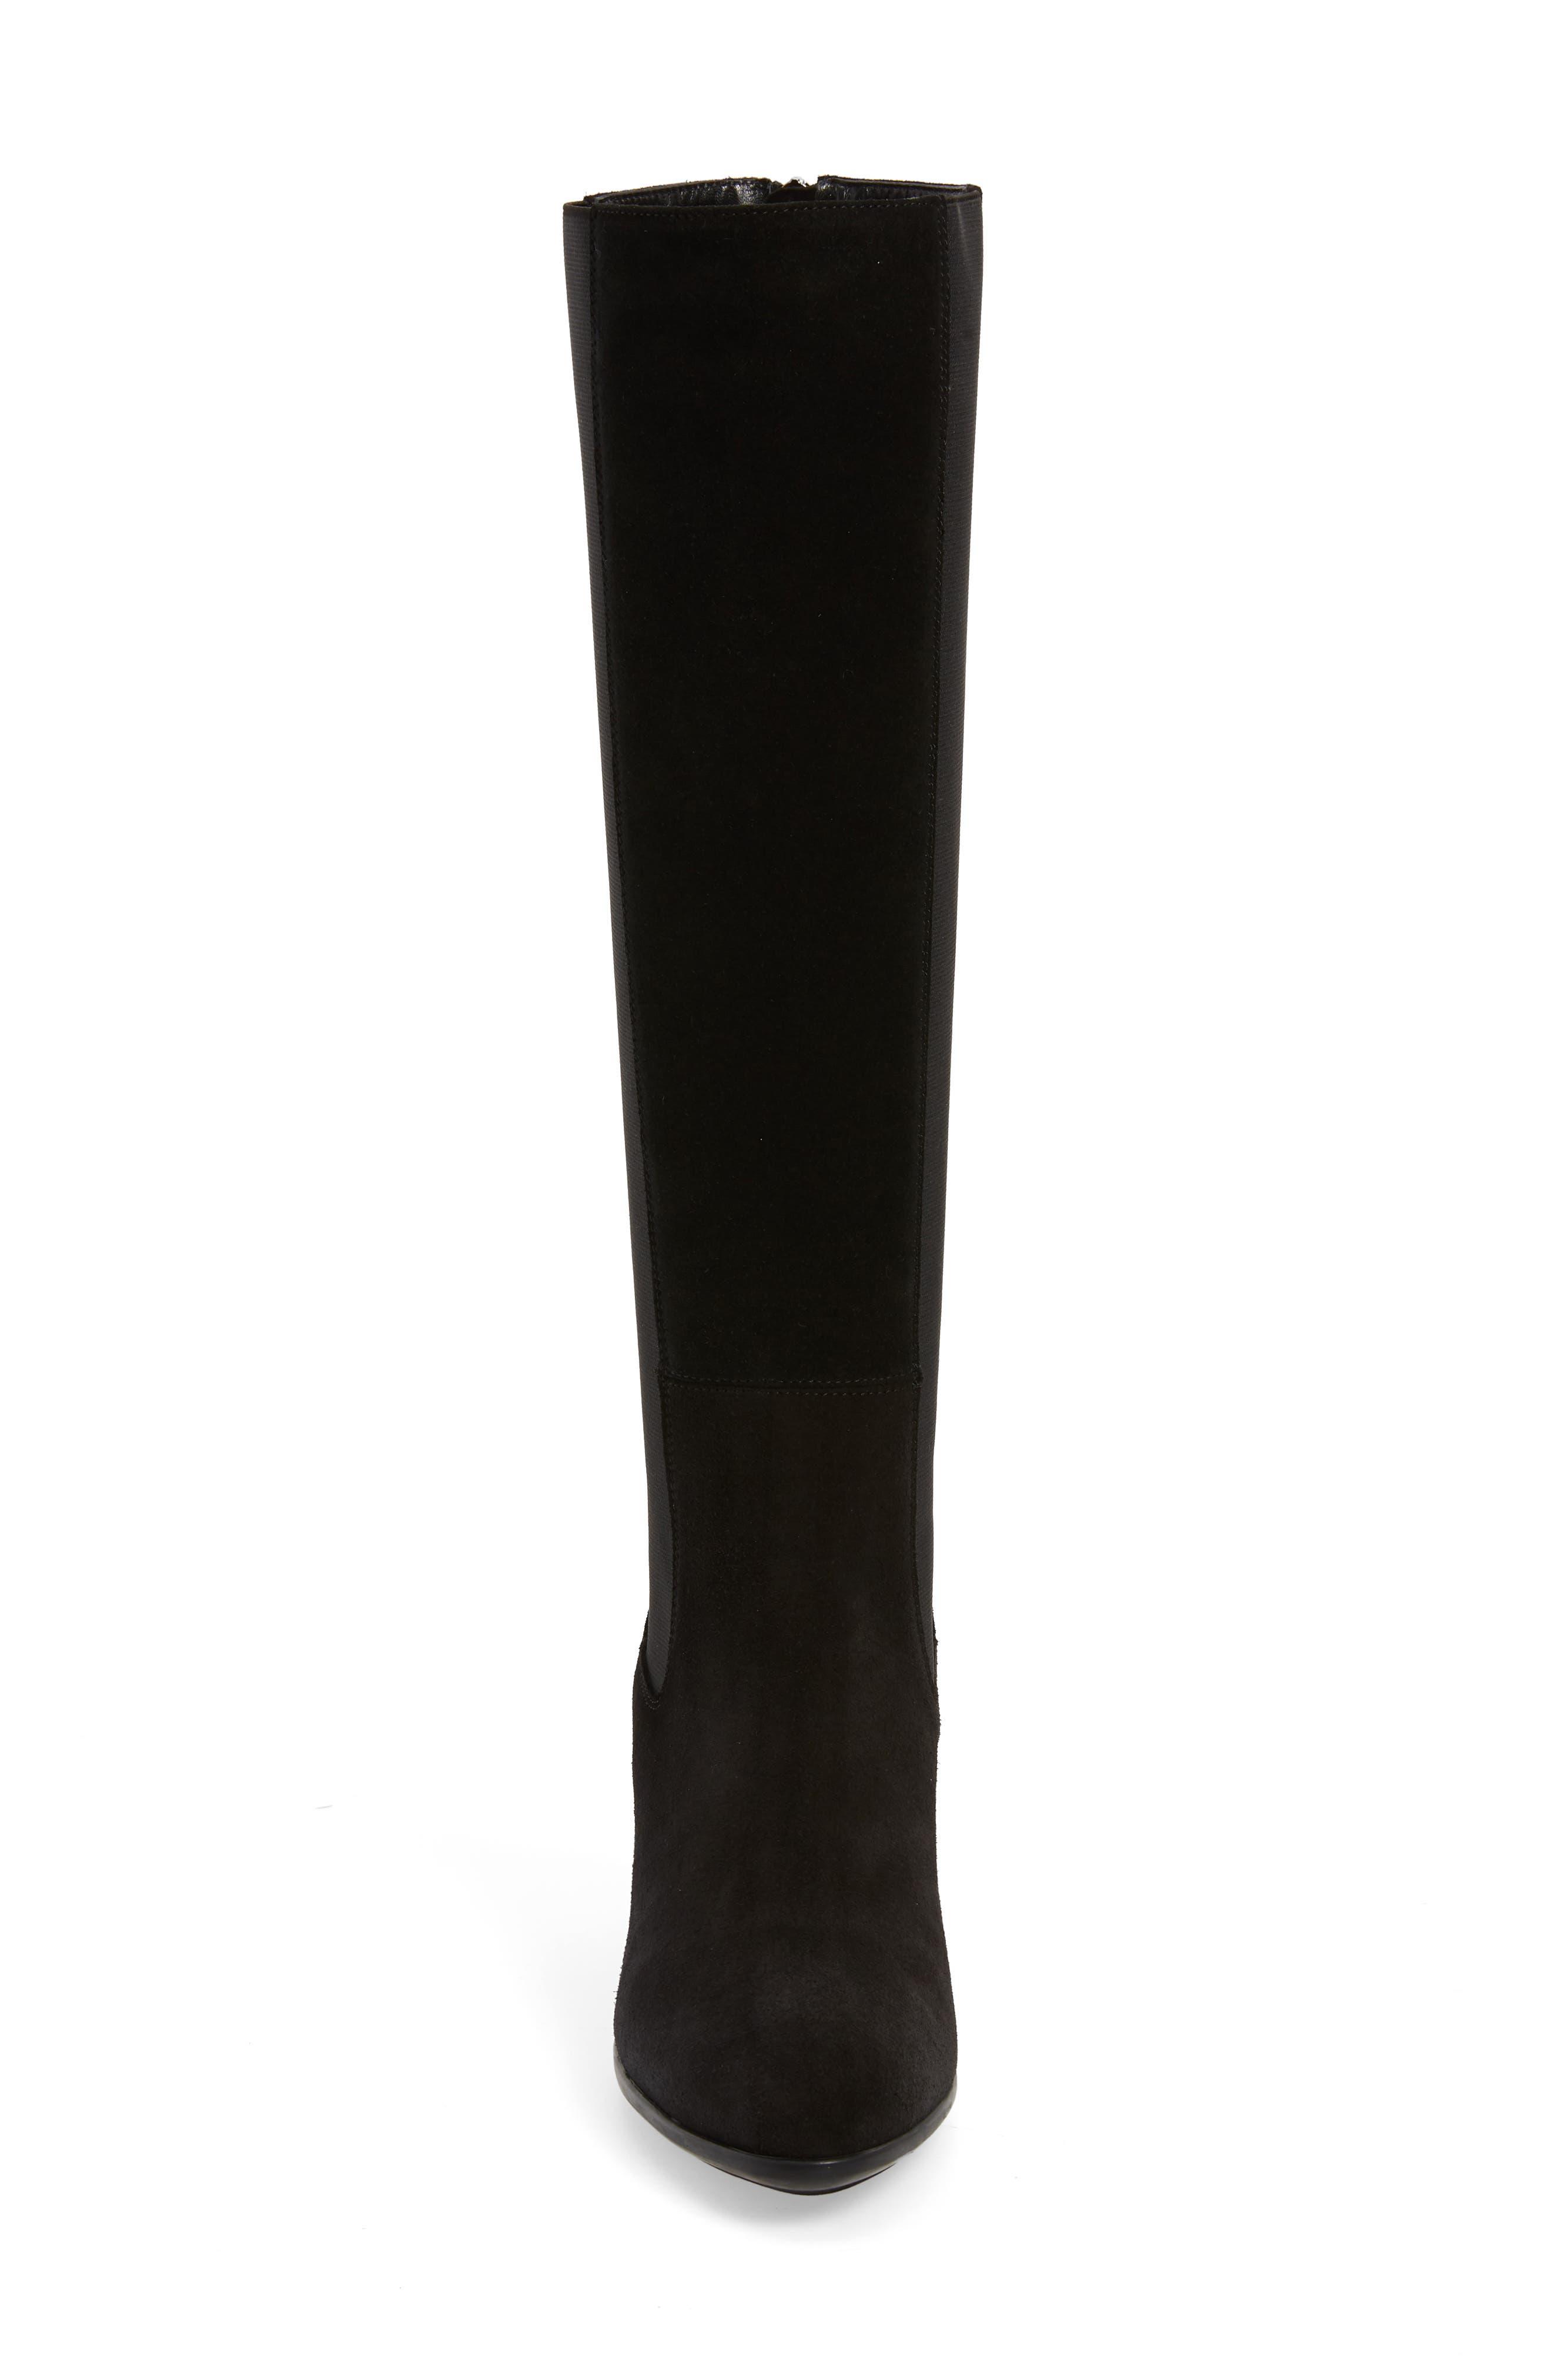 AQUATALIA, Dahliana Weatherproof Knee High Boot, Alternate thumbnail 4, color, BLACK